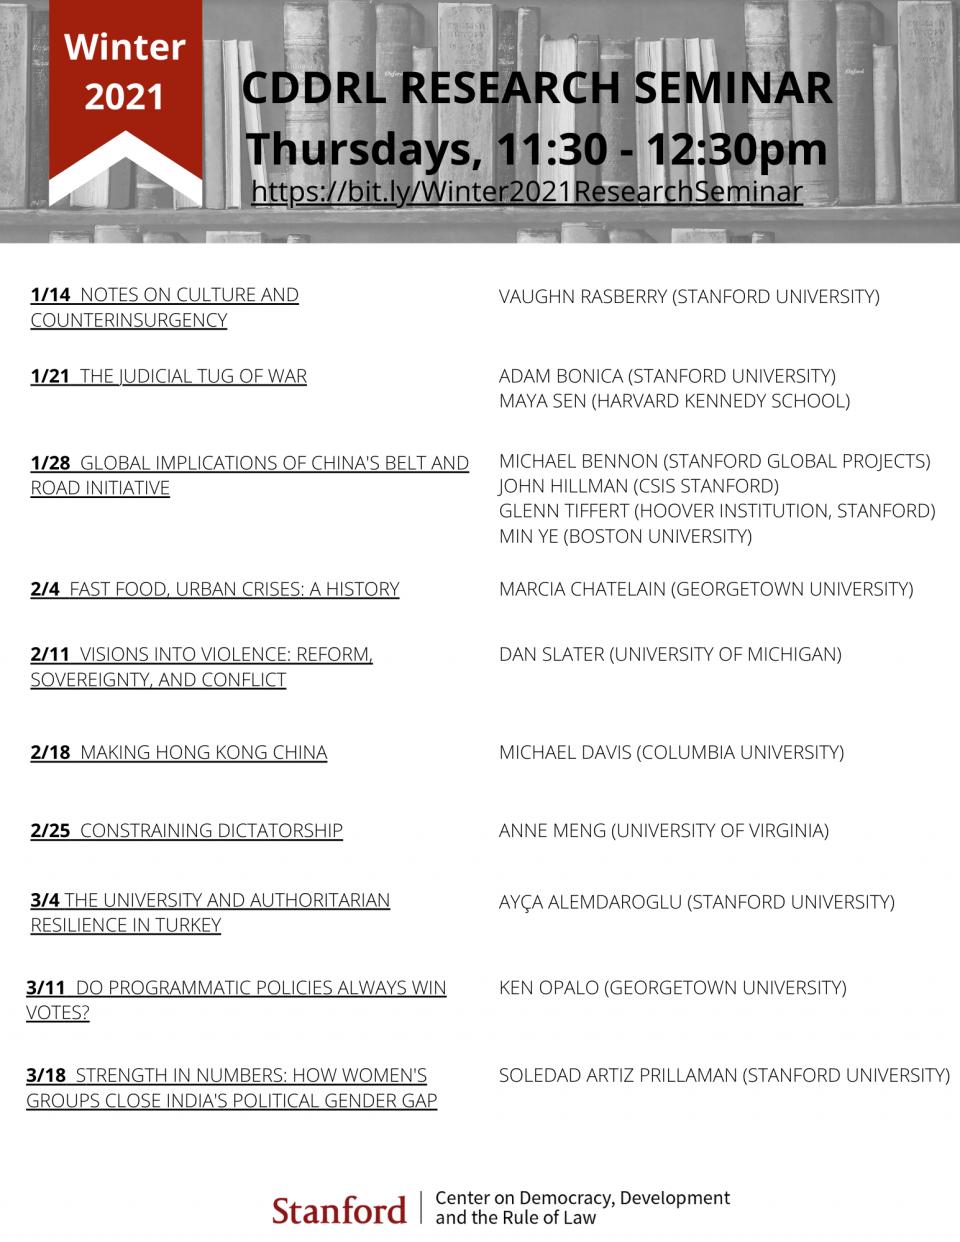 CDDRL Winter 2021 Research Seminar Schedule